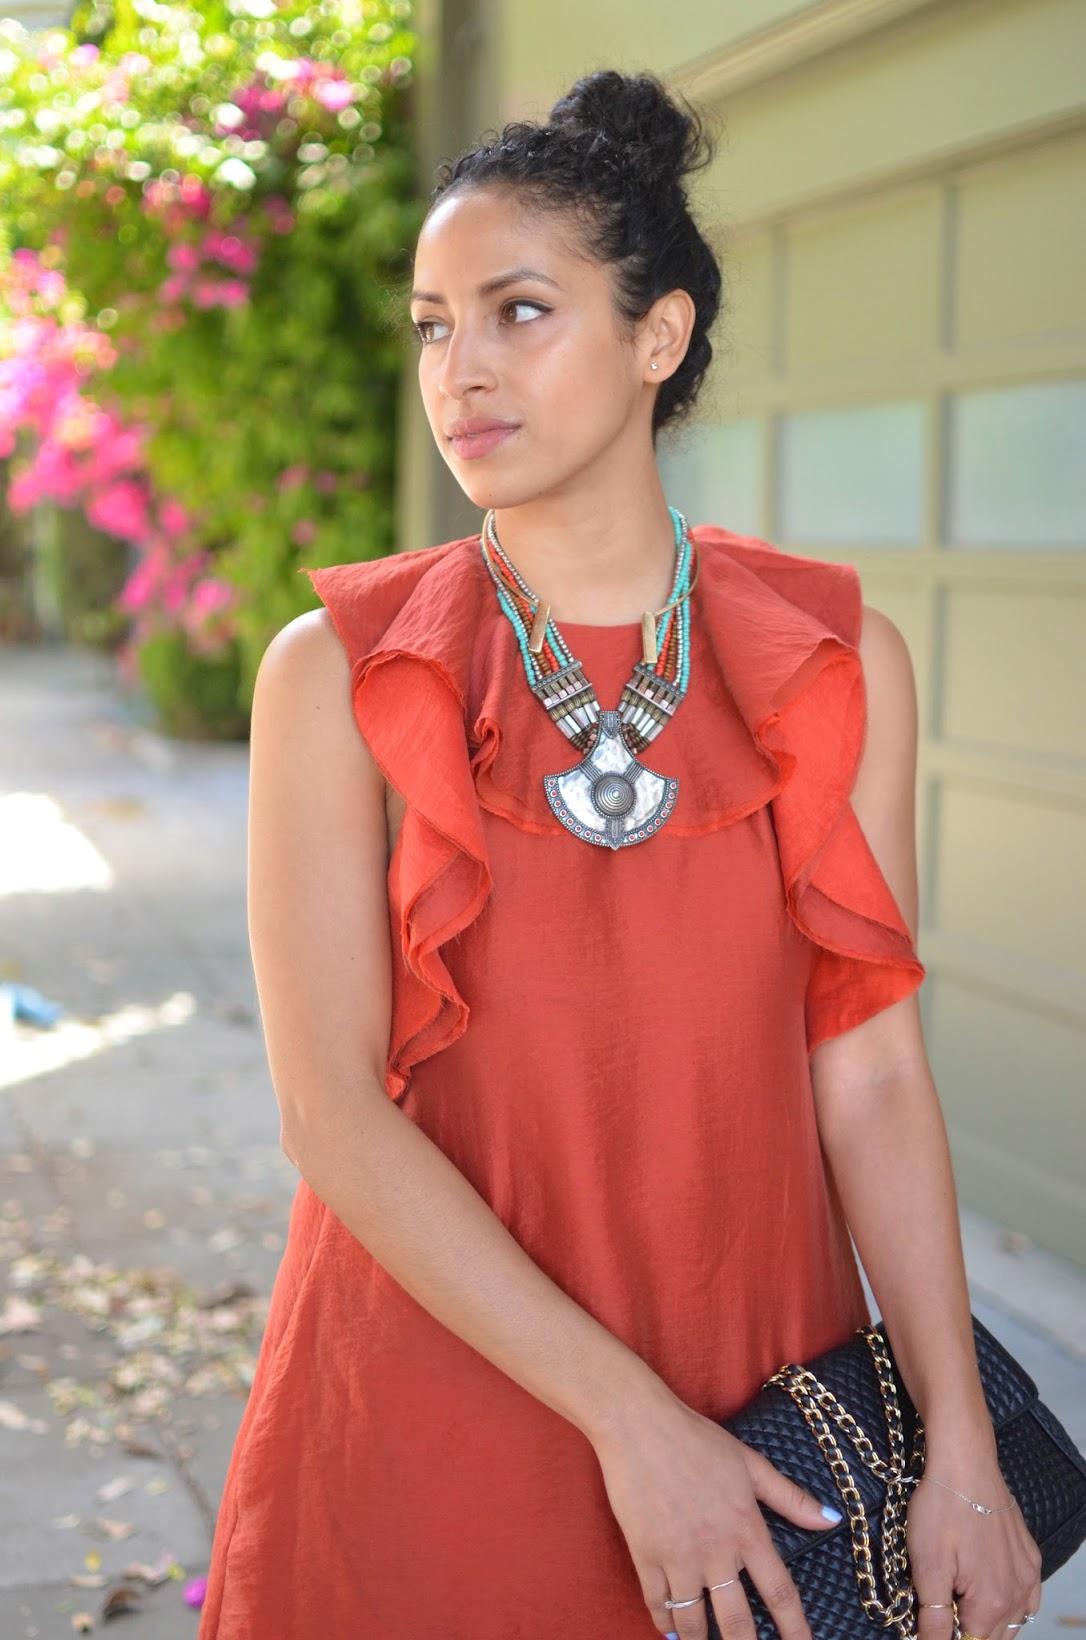 ruffle dress, orange ruffle H&M dress, conscious collection, H&M conscious collection ruffle dress, transitional dressing, autumn hues, H&M, Sophia Webster Coco Flamingo heels, Bally Chain bag